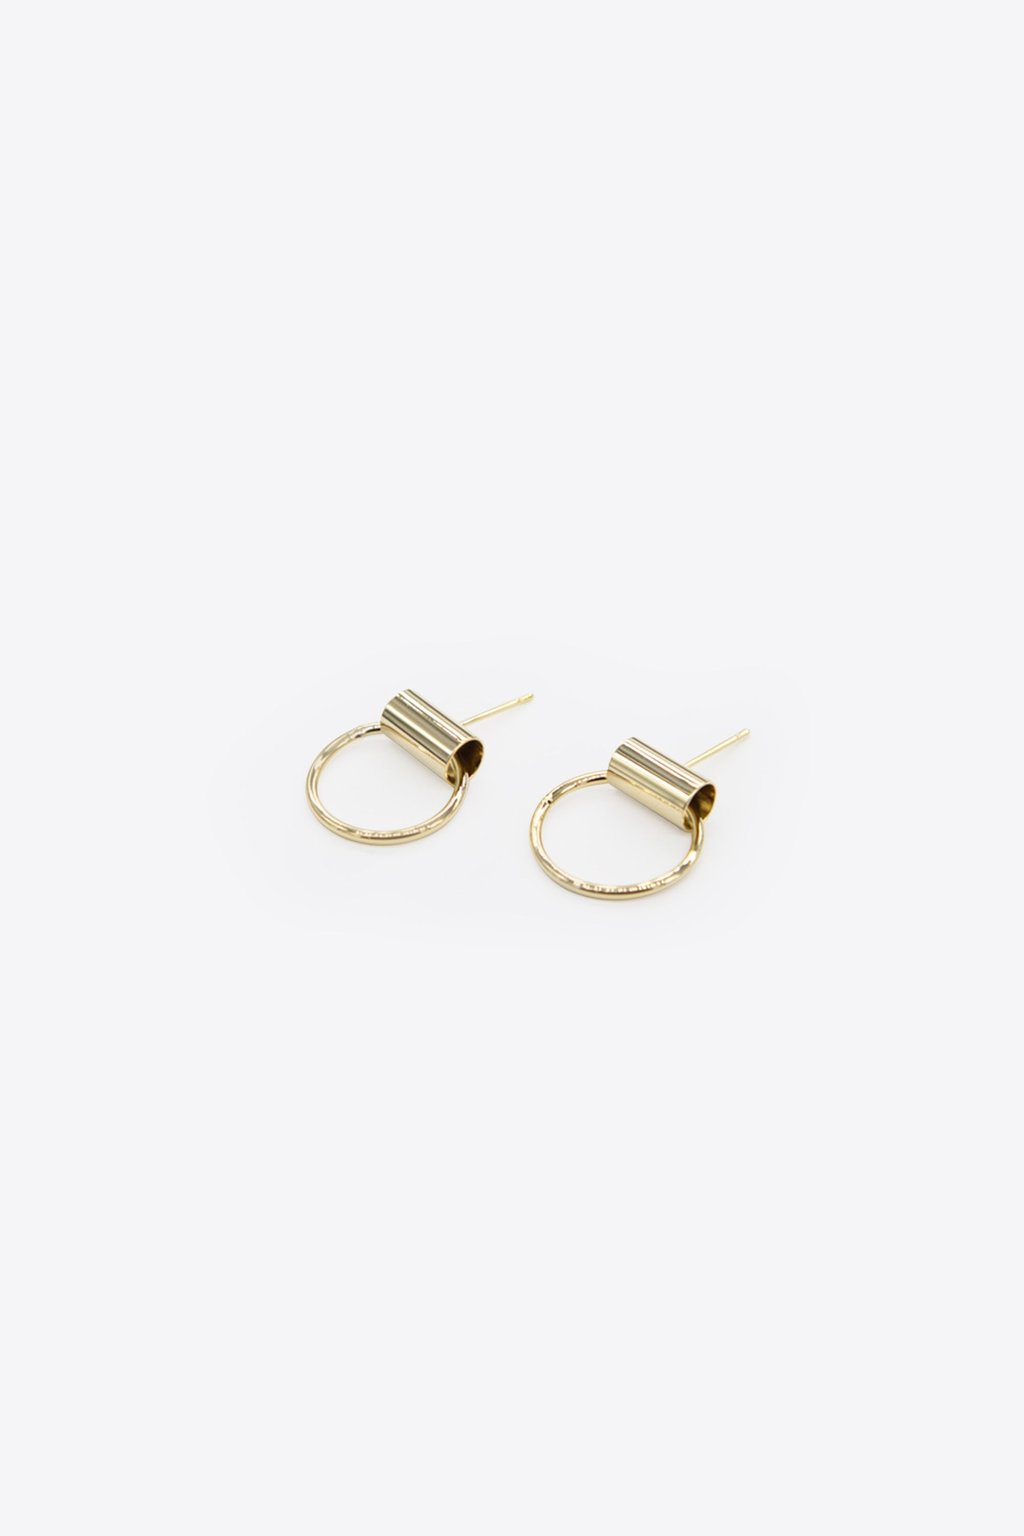 Earring H086 Gold 1